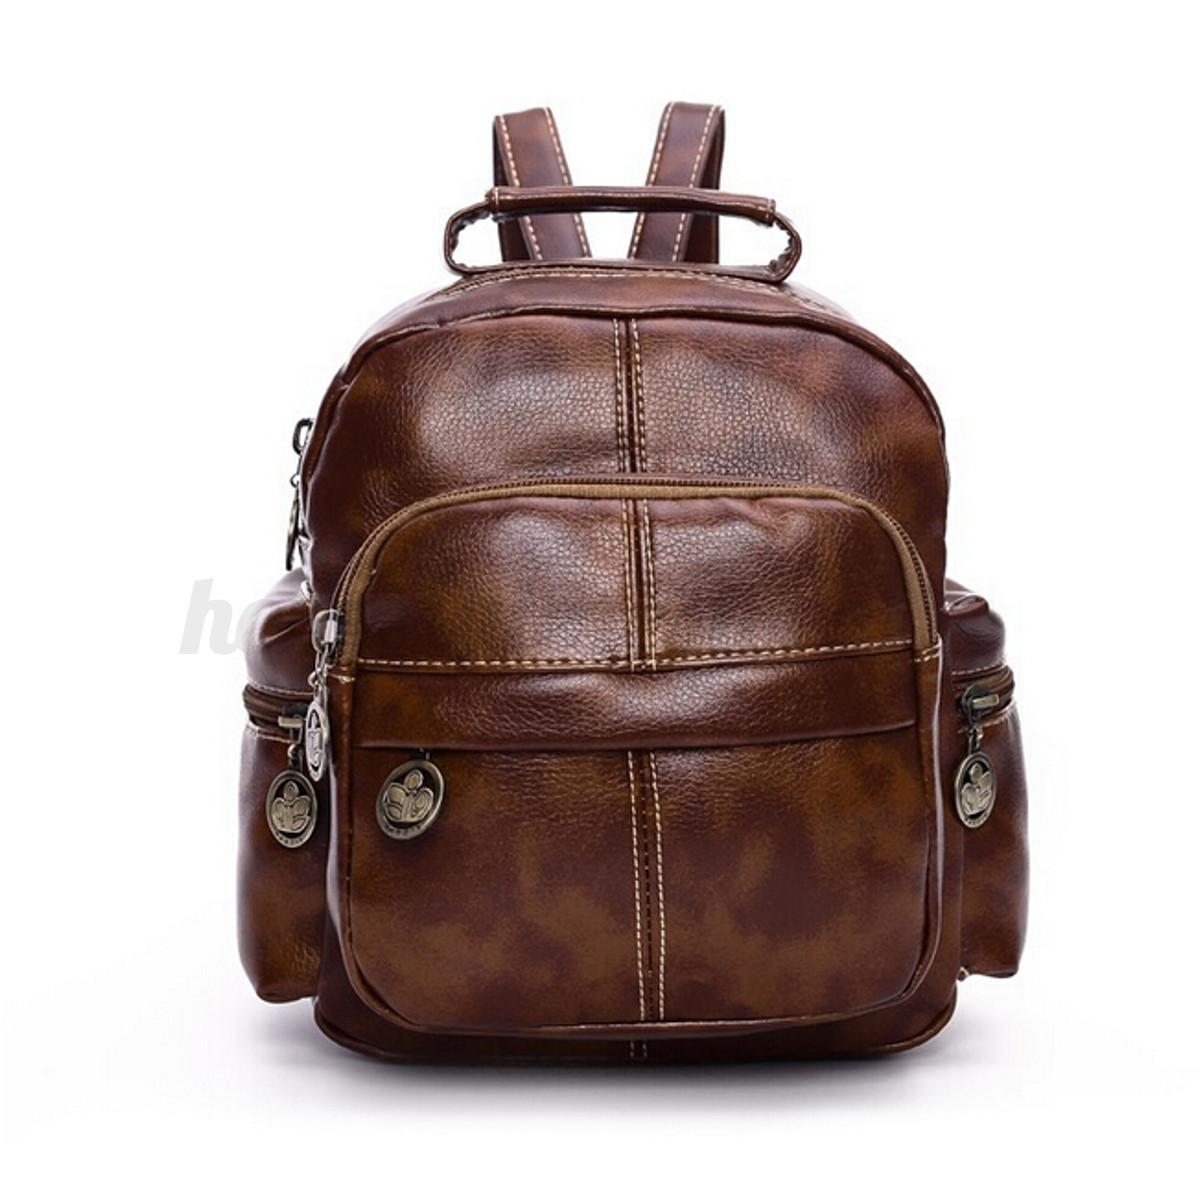 Fashion Women Vintage Mini Leather Travel Backpack Tote Rucksack ...